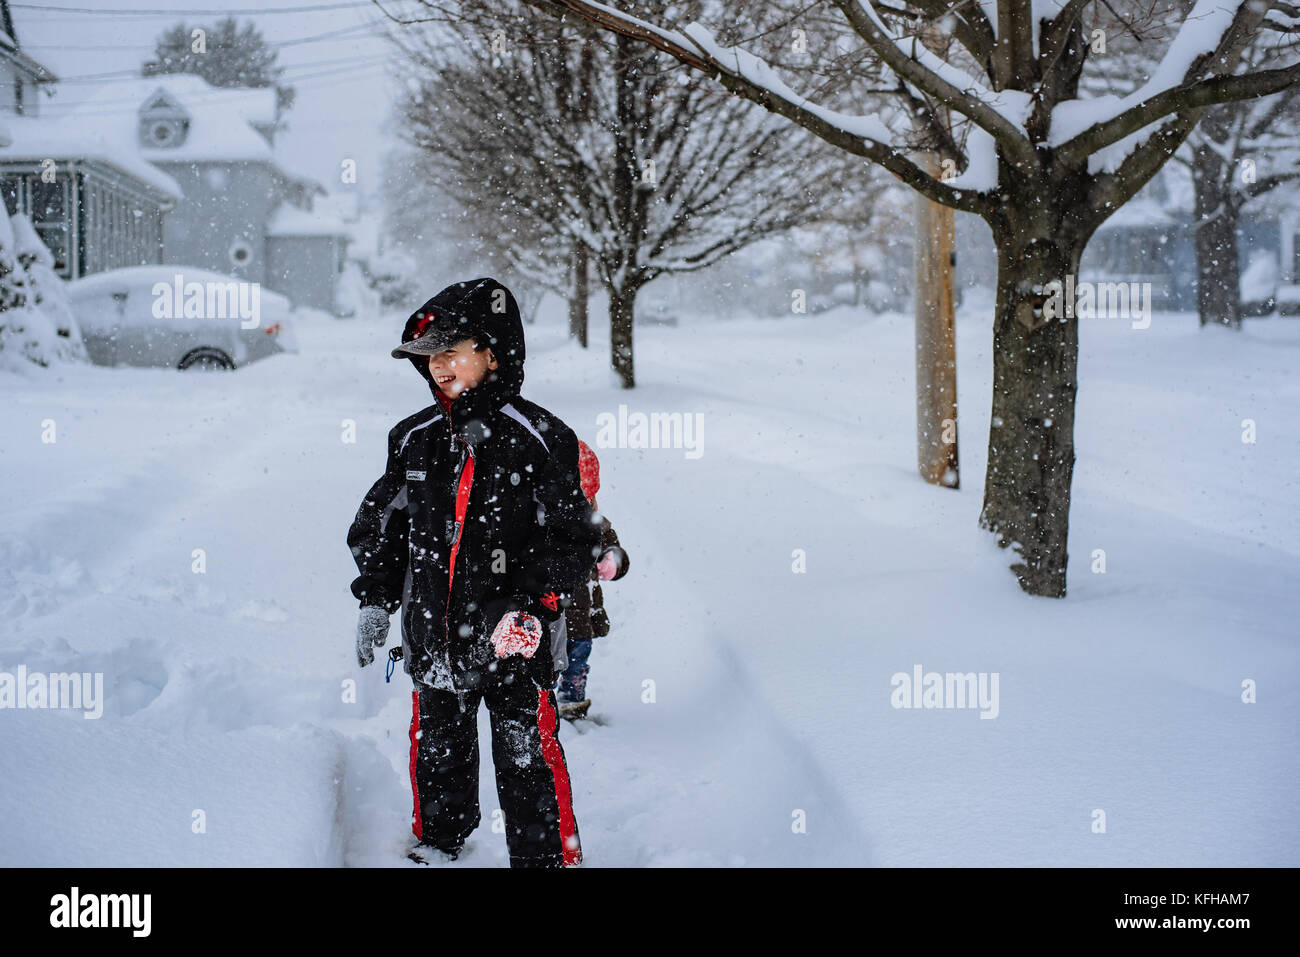 10-11 Jährige Junge im Schnee Stockbild